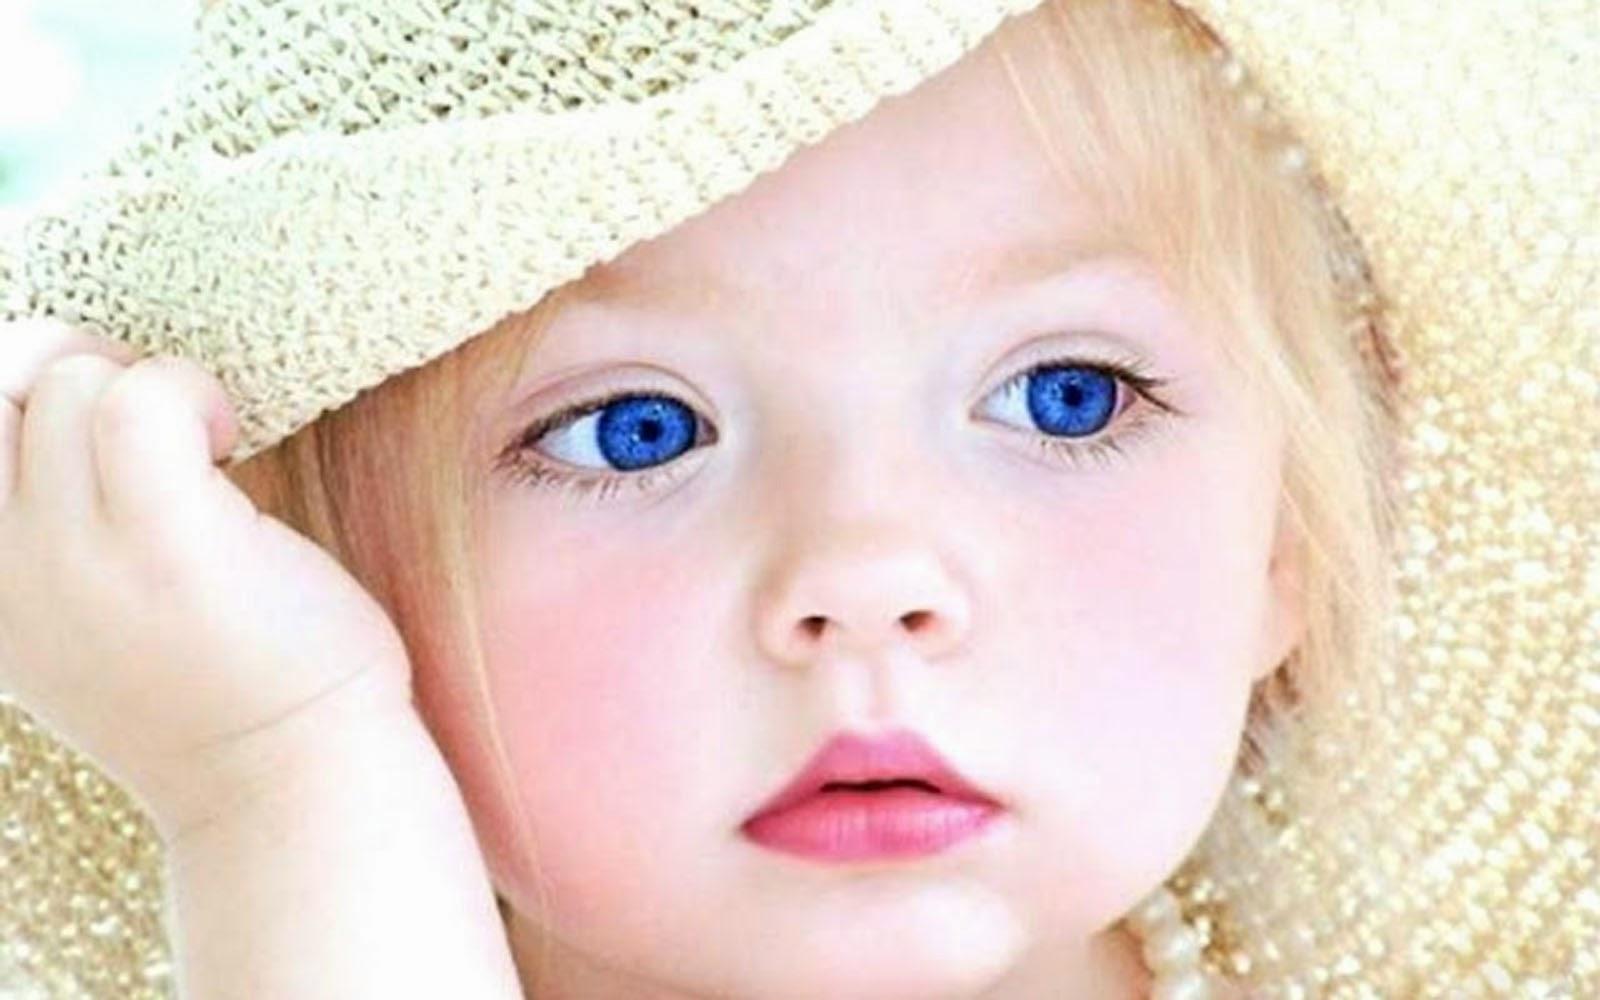 49+] free baby wallpaper images on wallpapersafari.